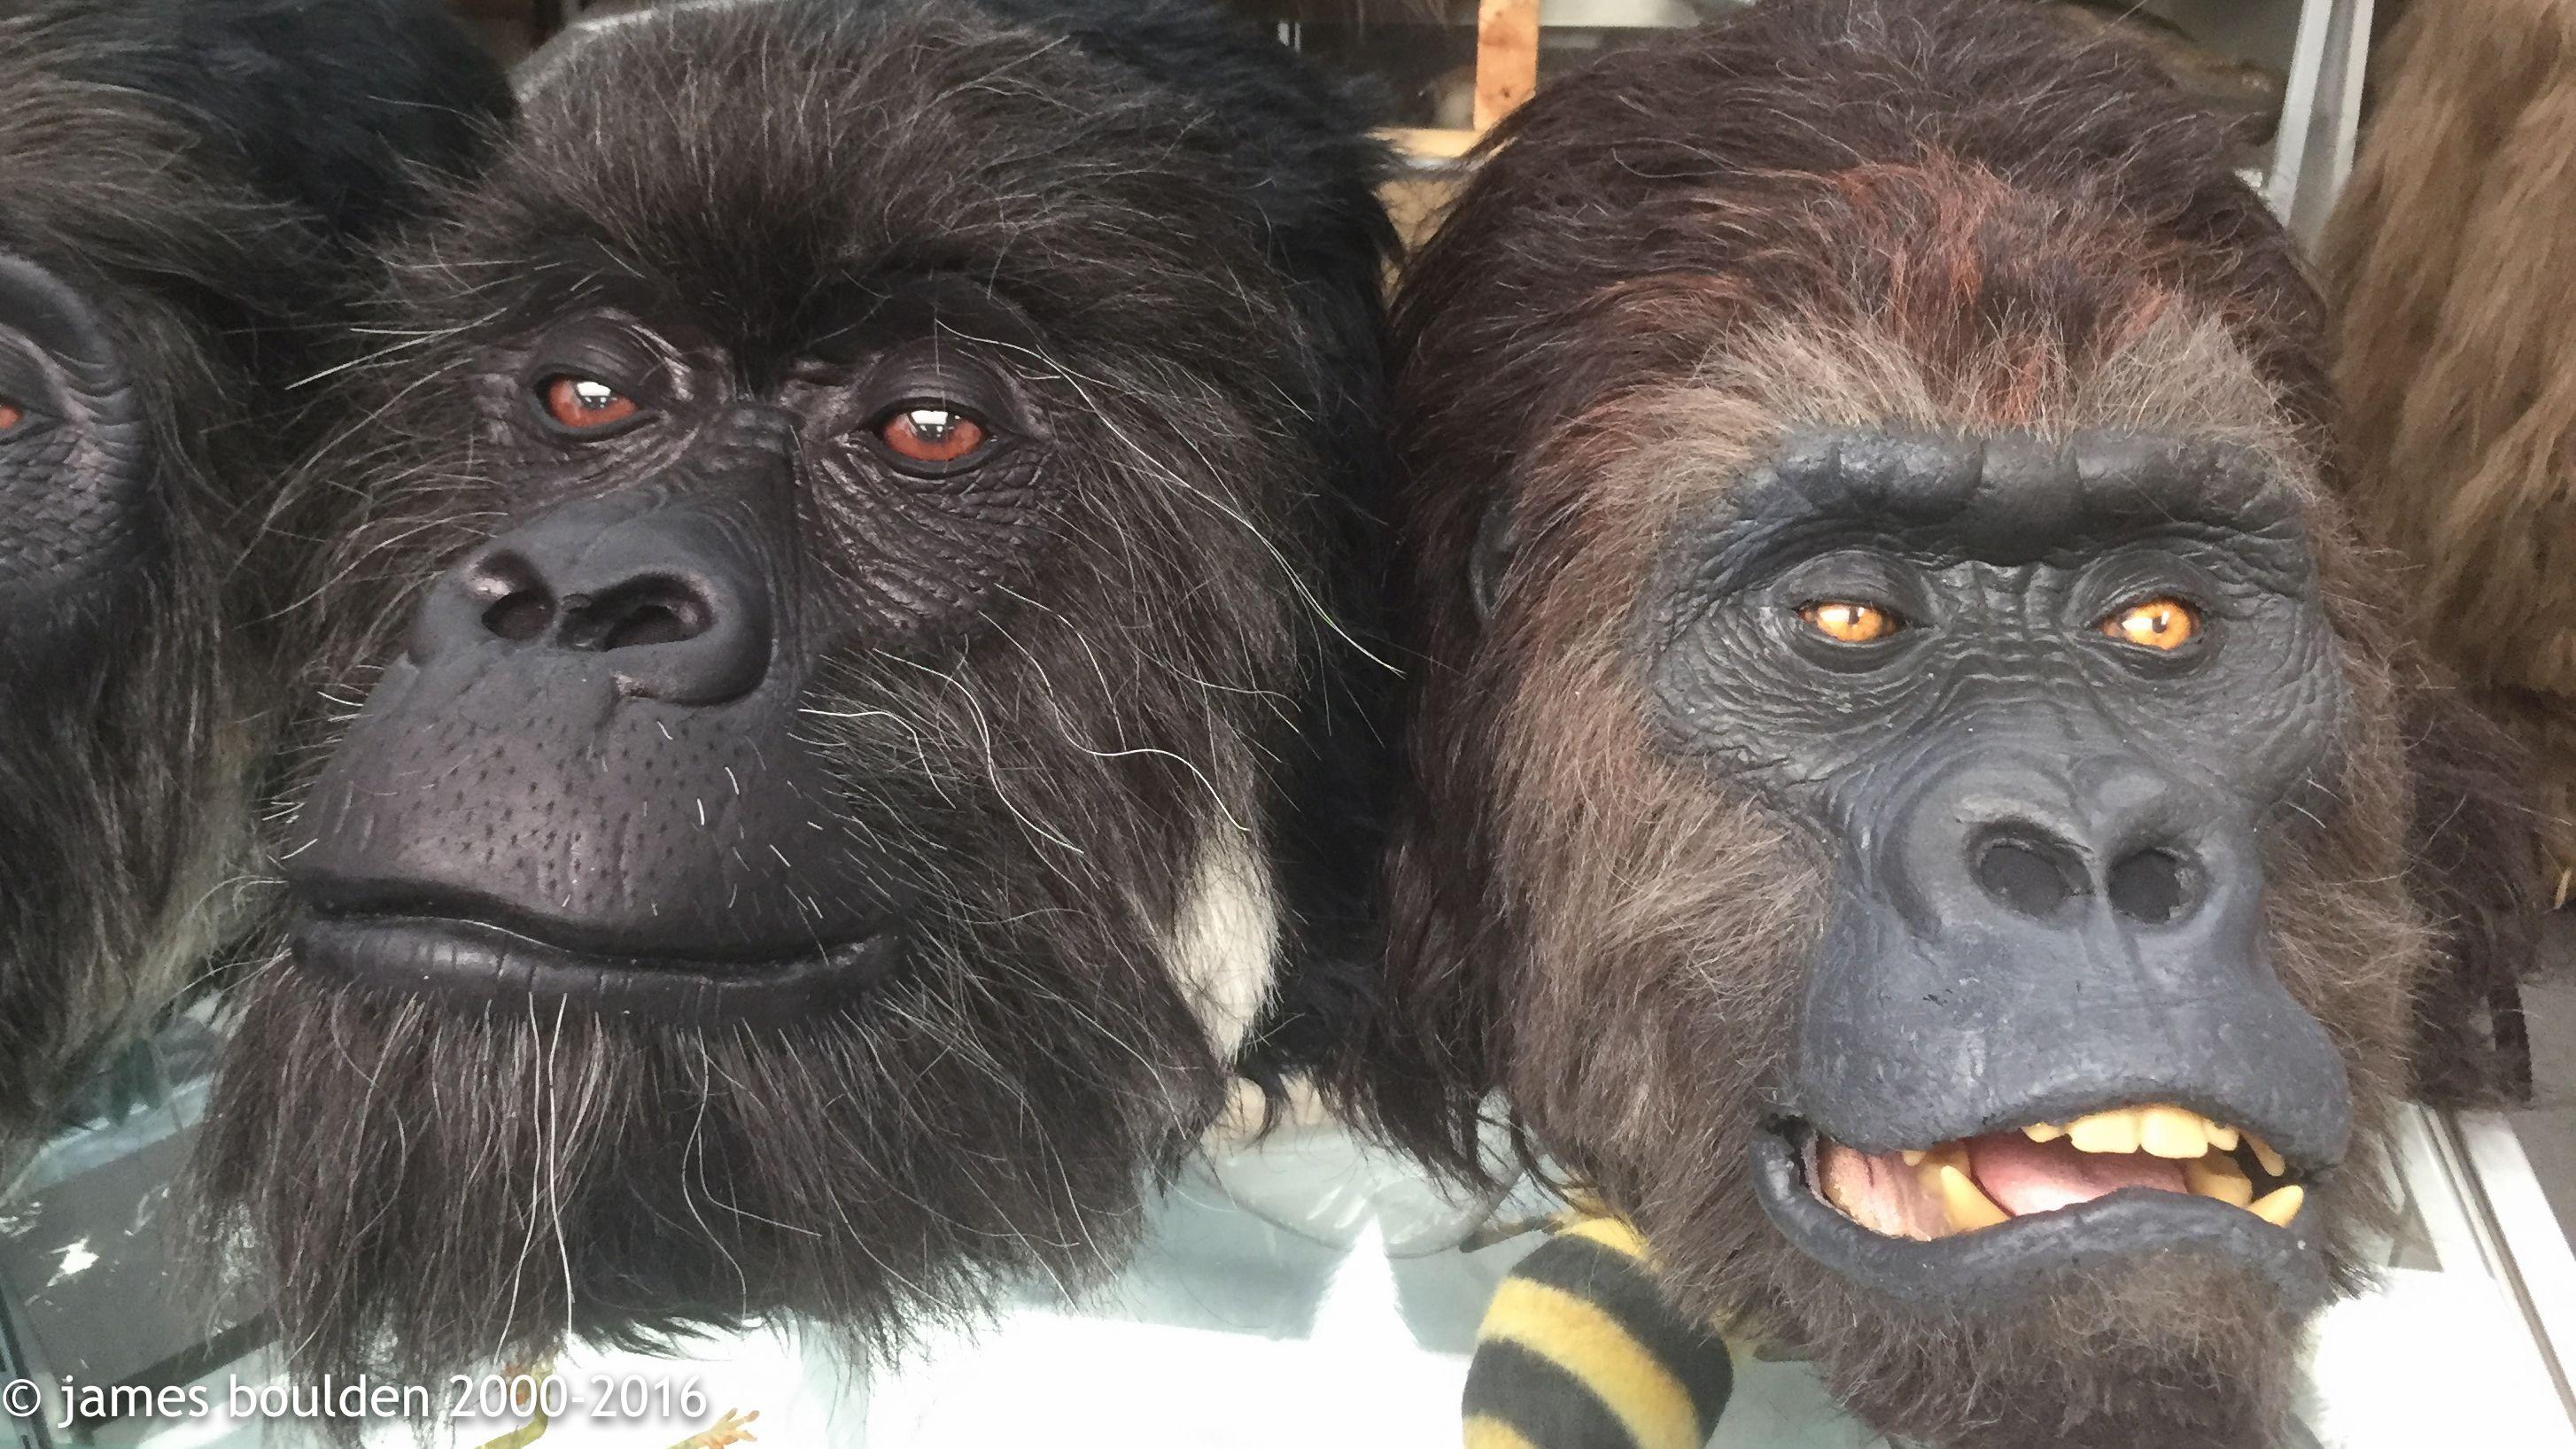 Chimp Mask Monkey Chimpanzee Arms Hands Planet Apes Animal Fancy Dress Costume